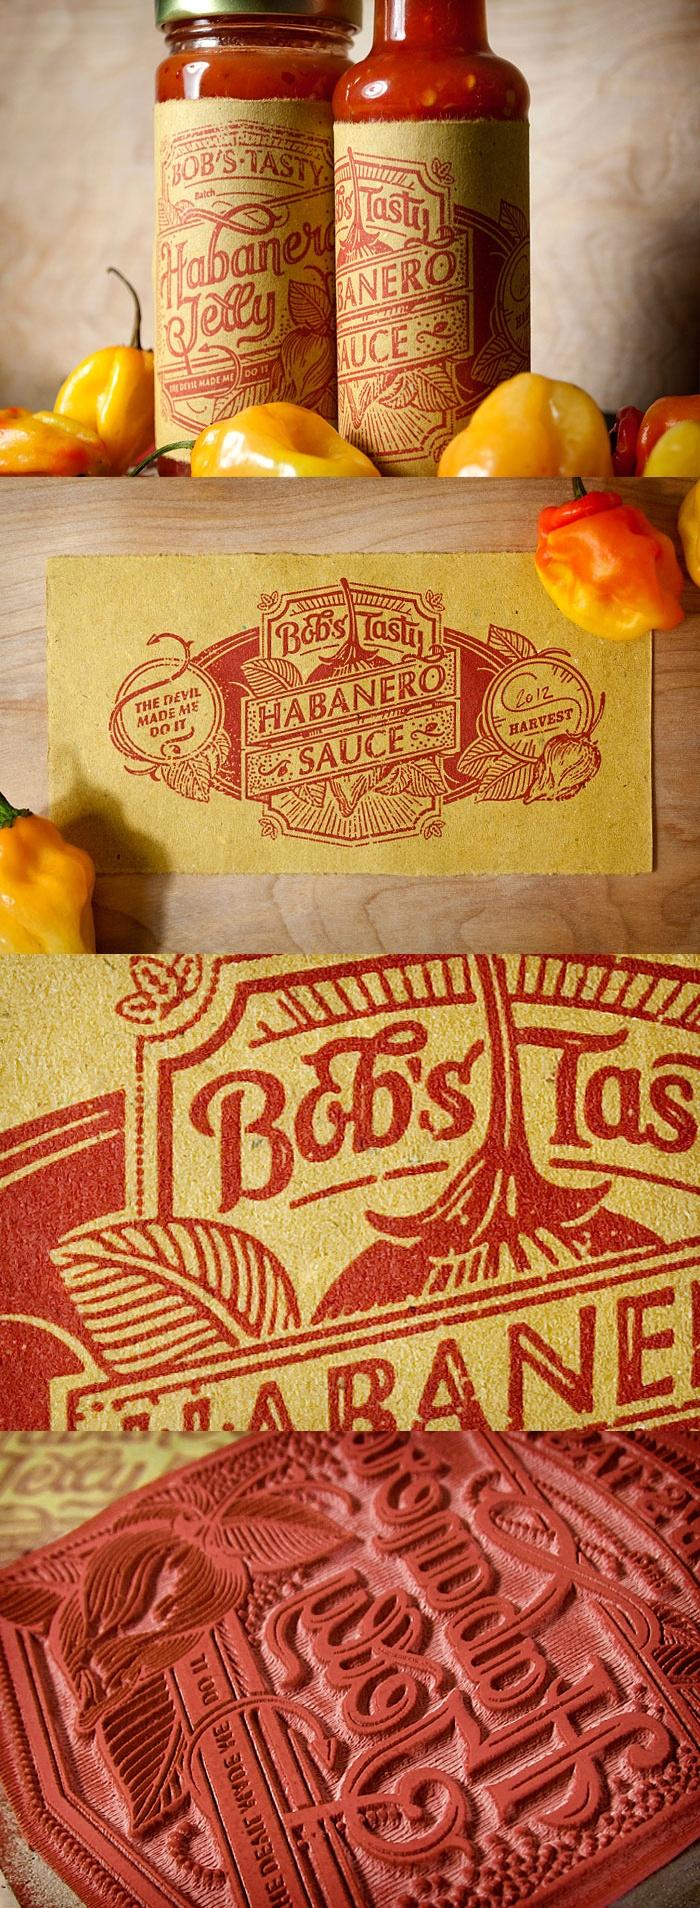 Bob's Tasty Habanero Sauce via http://www.notcot.org/post/50415/